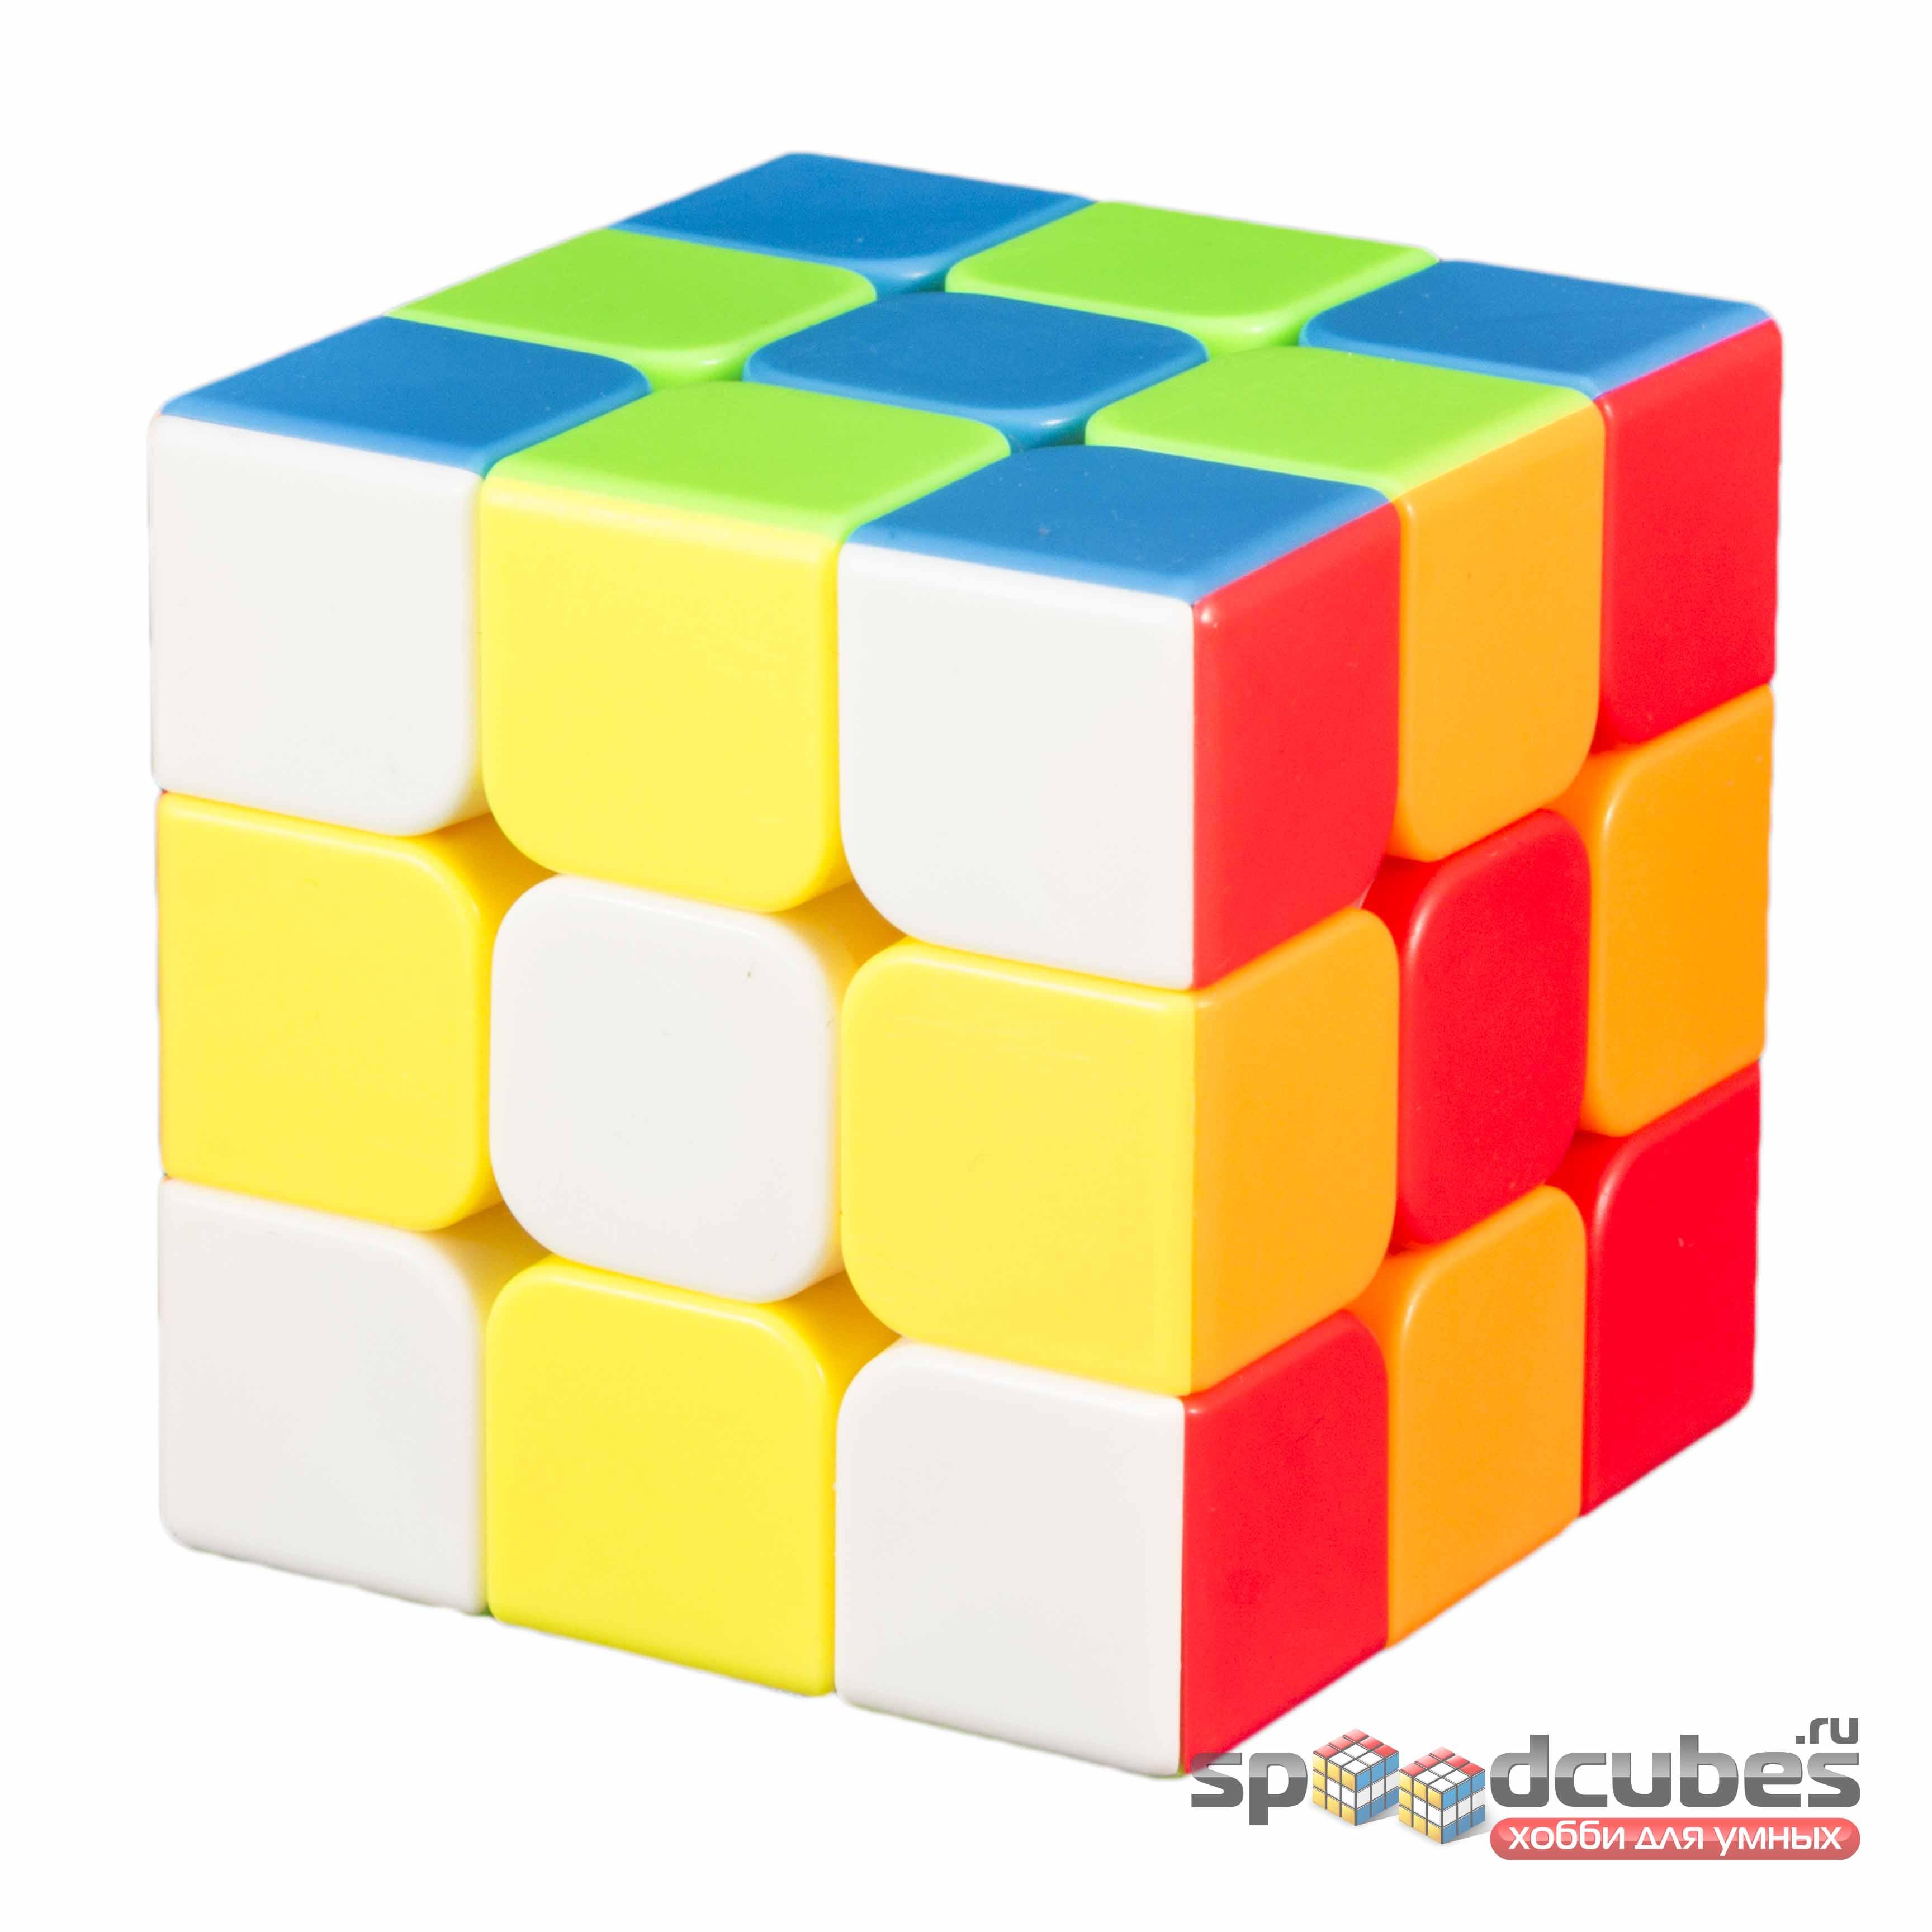 MoYu Cubing Classroom Mini (набор Moyu MF2s, MF3s, MF4s) 4